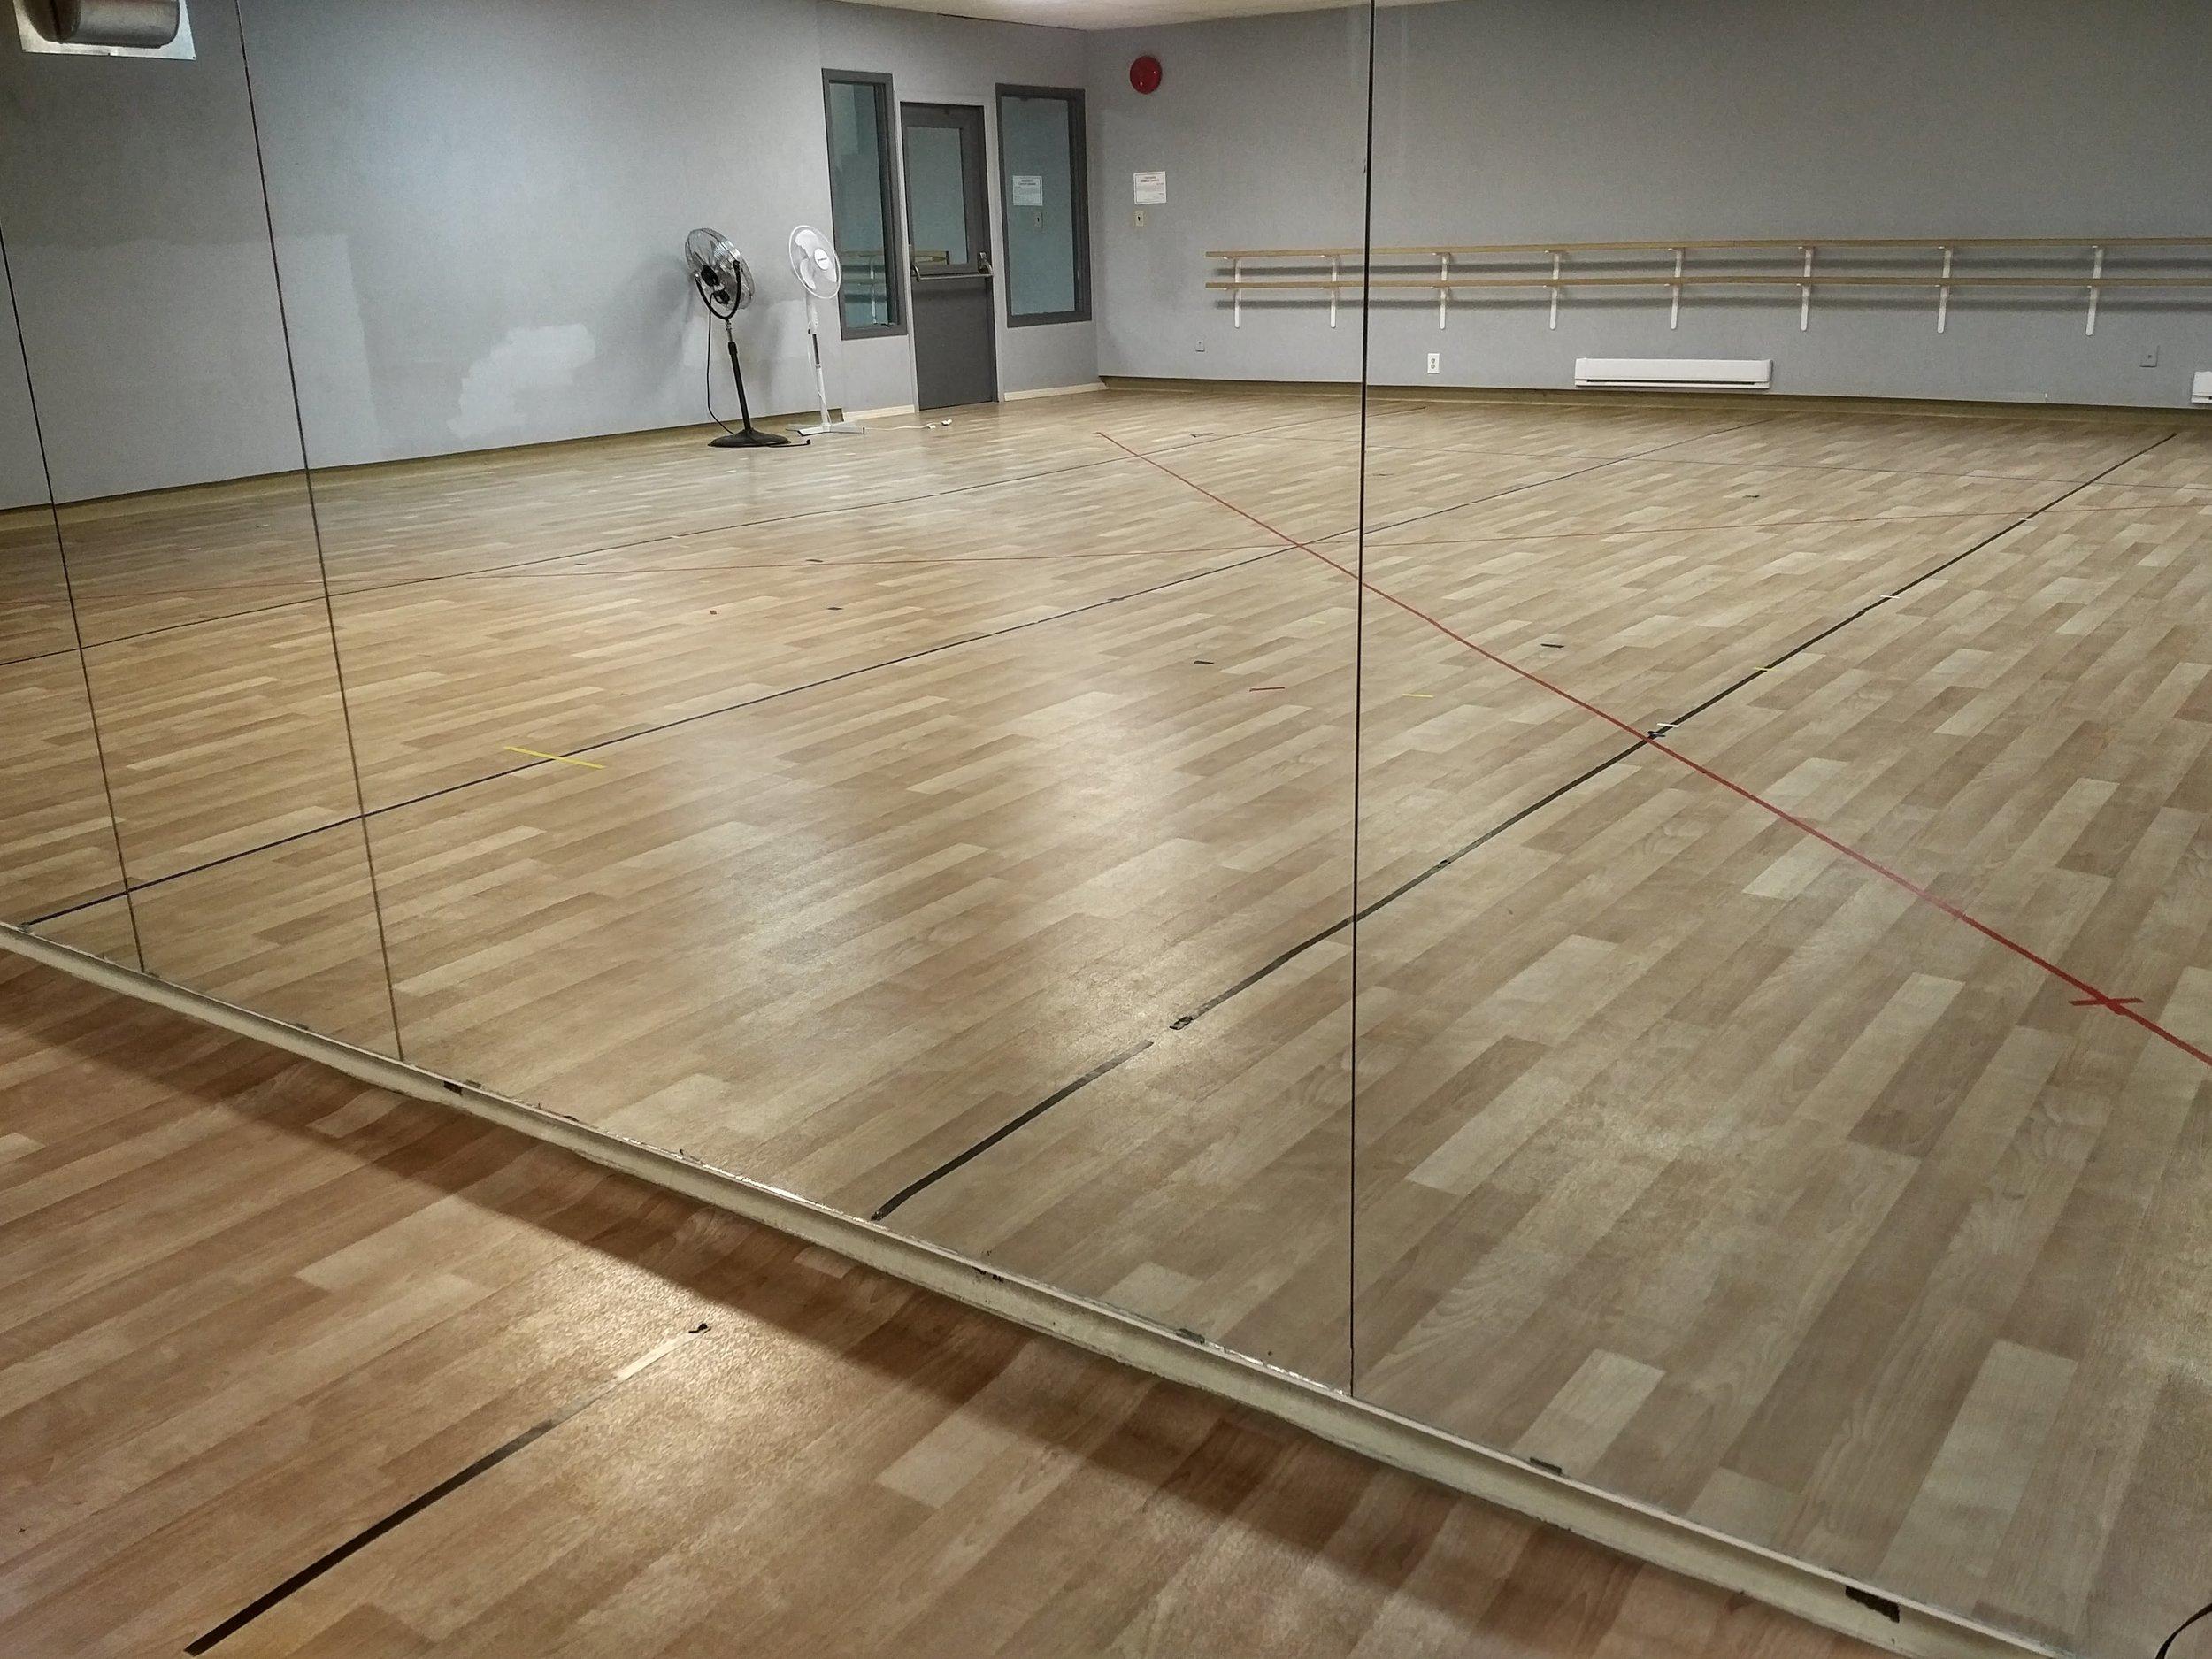 Dance Studio - The Dance Studio has wooden spring flooring, wall mirrors, ballet bars, and dedicated washrooms.